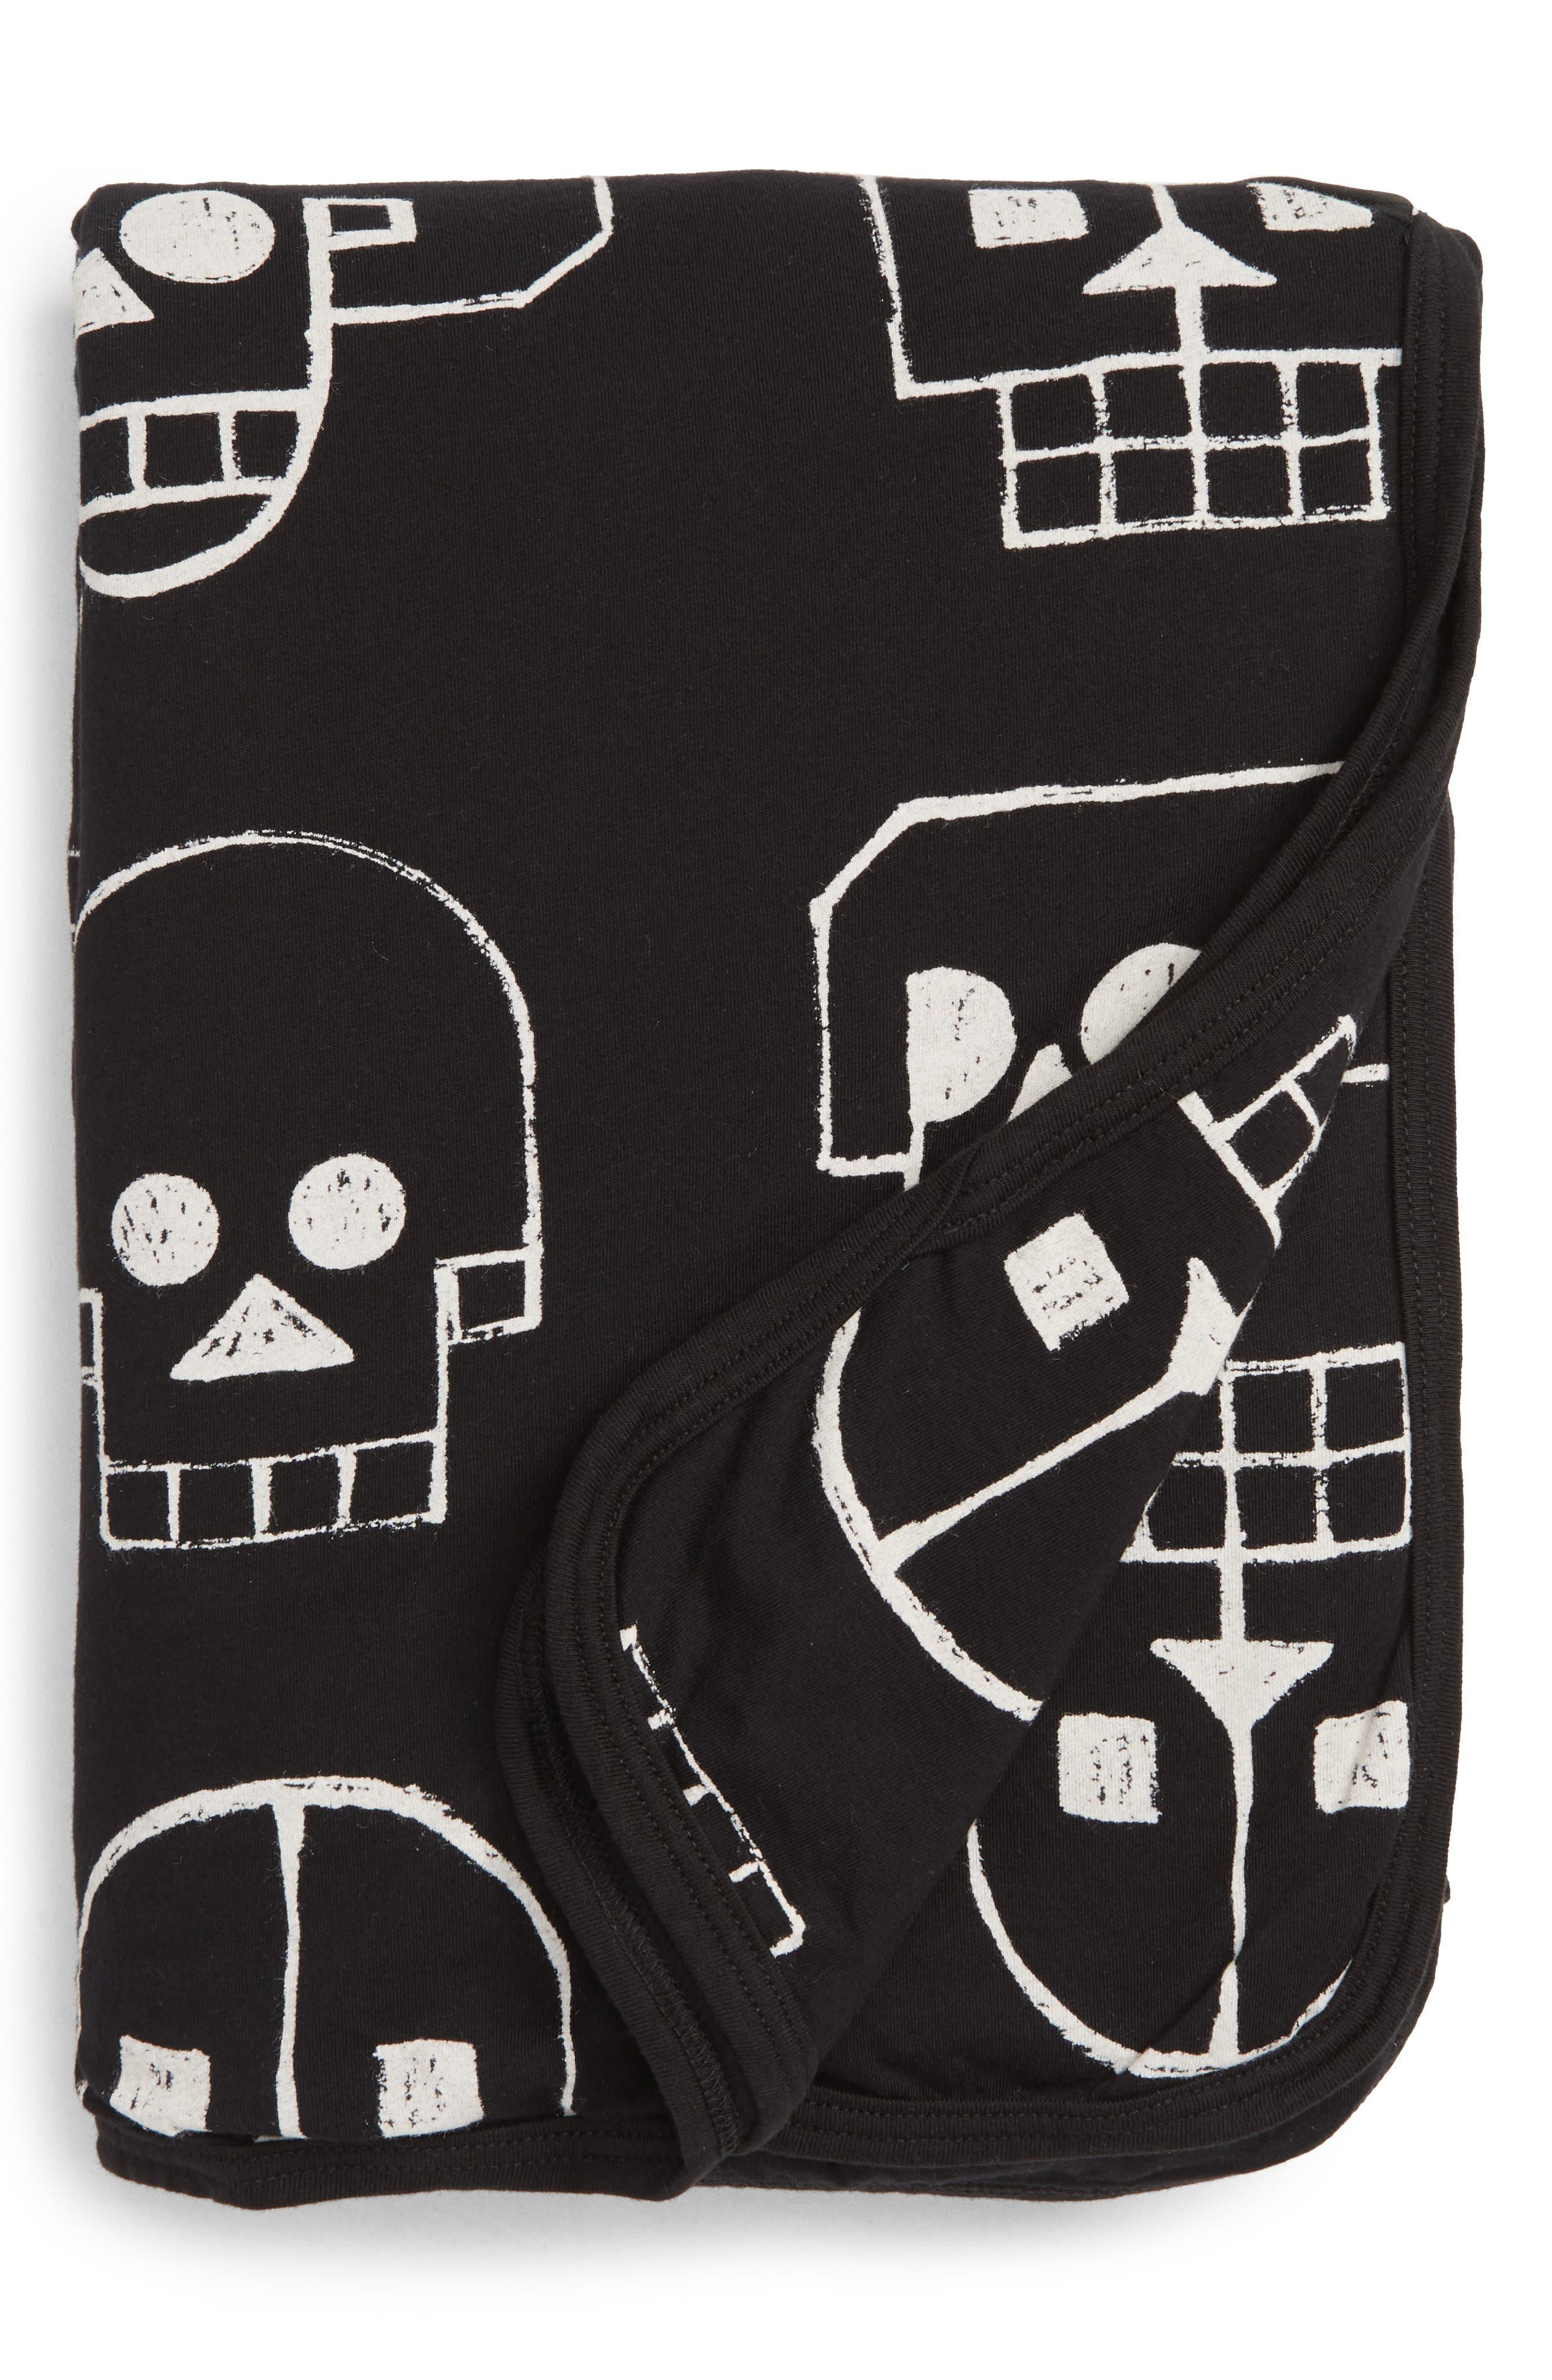 Skull Robot Print Blanket,                             Main thumbnail 1, color,                             001